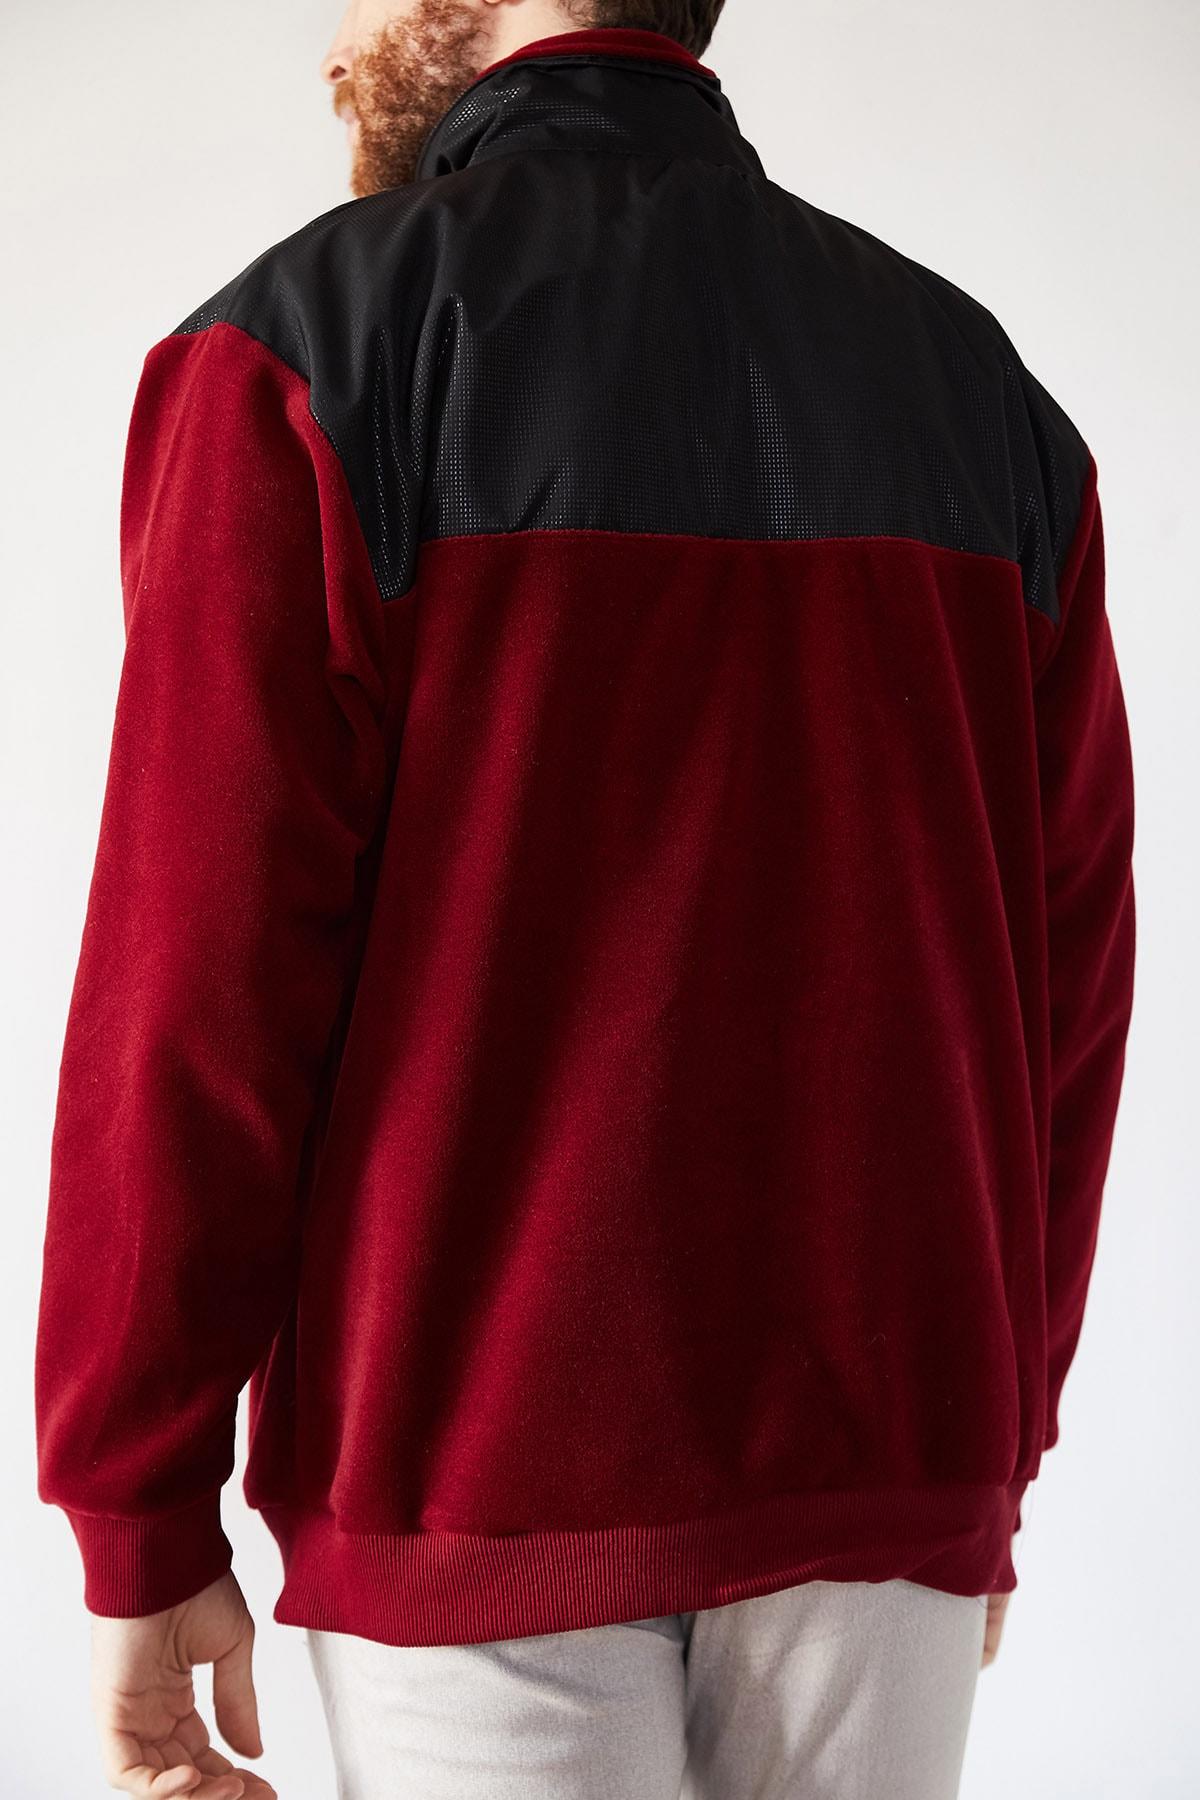 XHAN Erkek Bordo Deri Garnili Polar Sweatshirt 1kxe8-44233-05 2